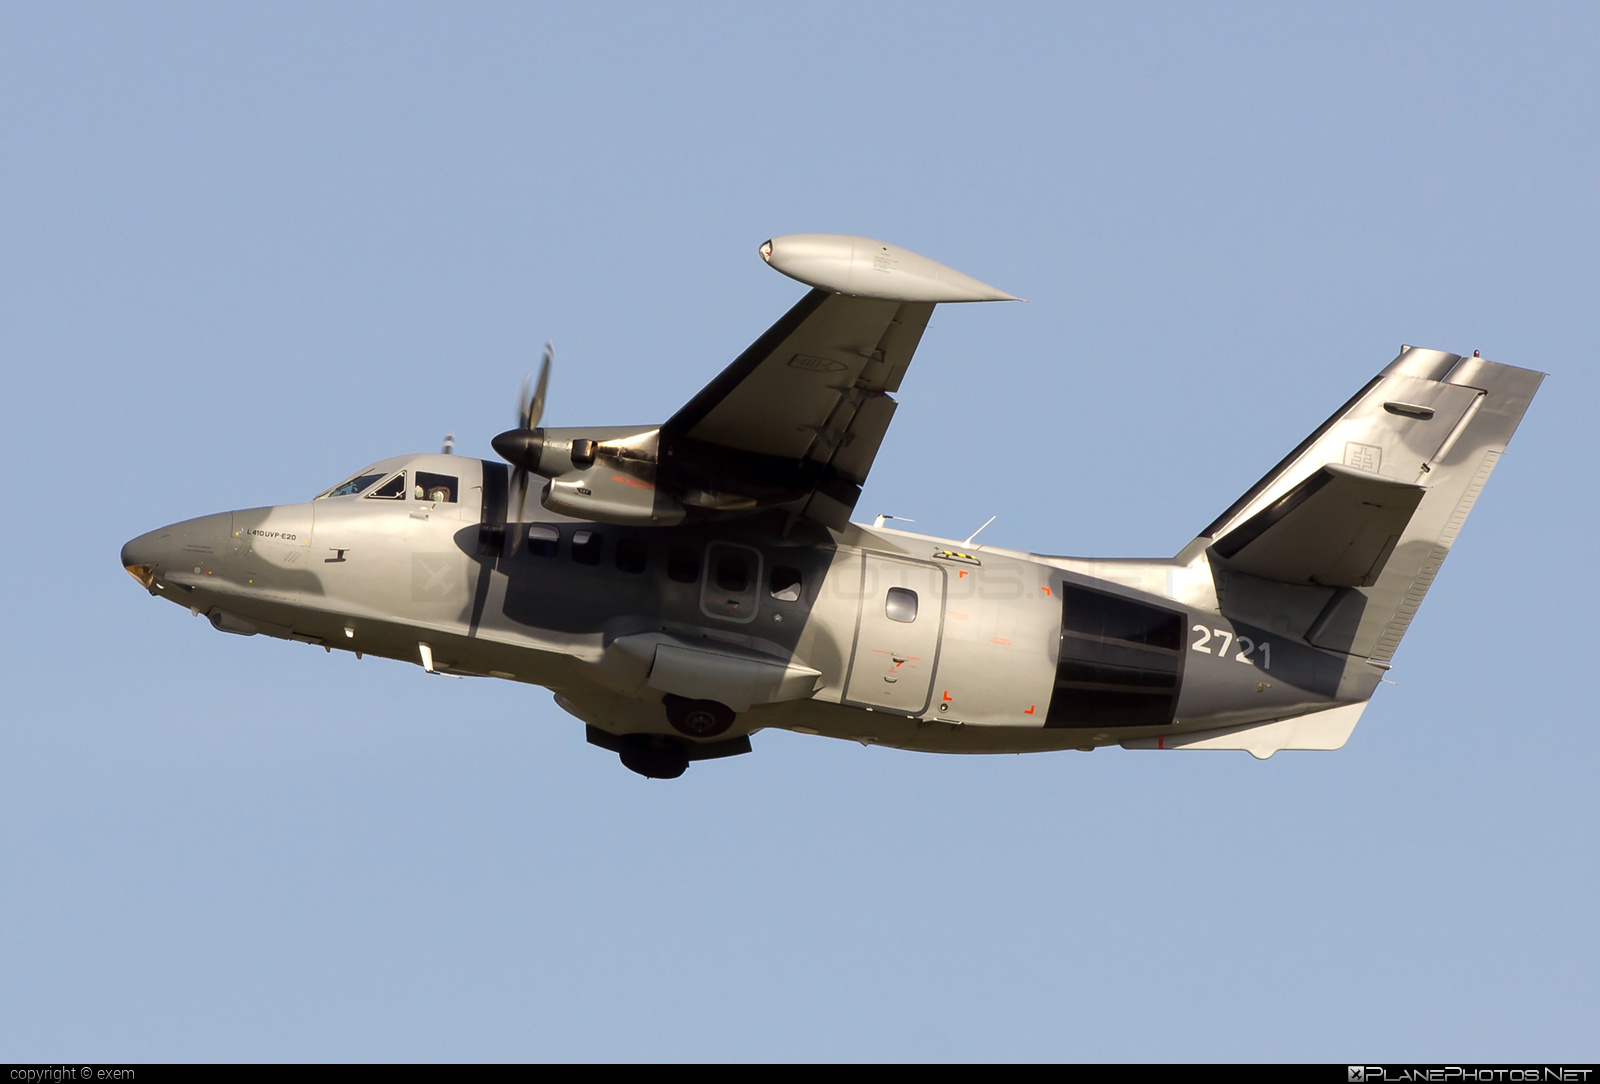 Let L-410UVP-E20 Turbolet - 2721 operated by Vzdušné sily OS SR (Slovak Air Force) #let #slovakairforce #vzdusnesilyossr